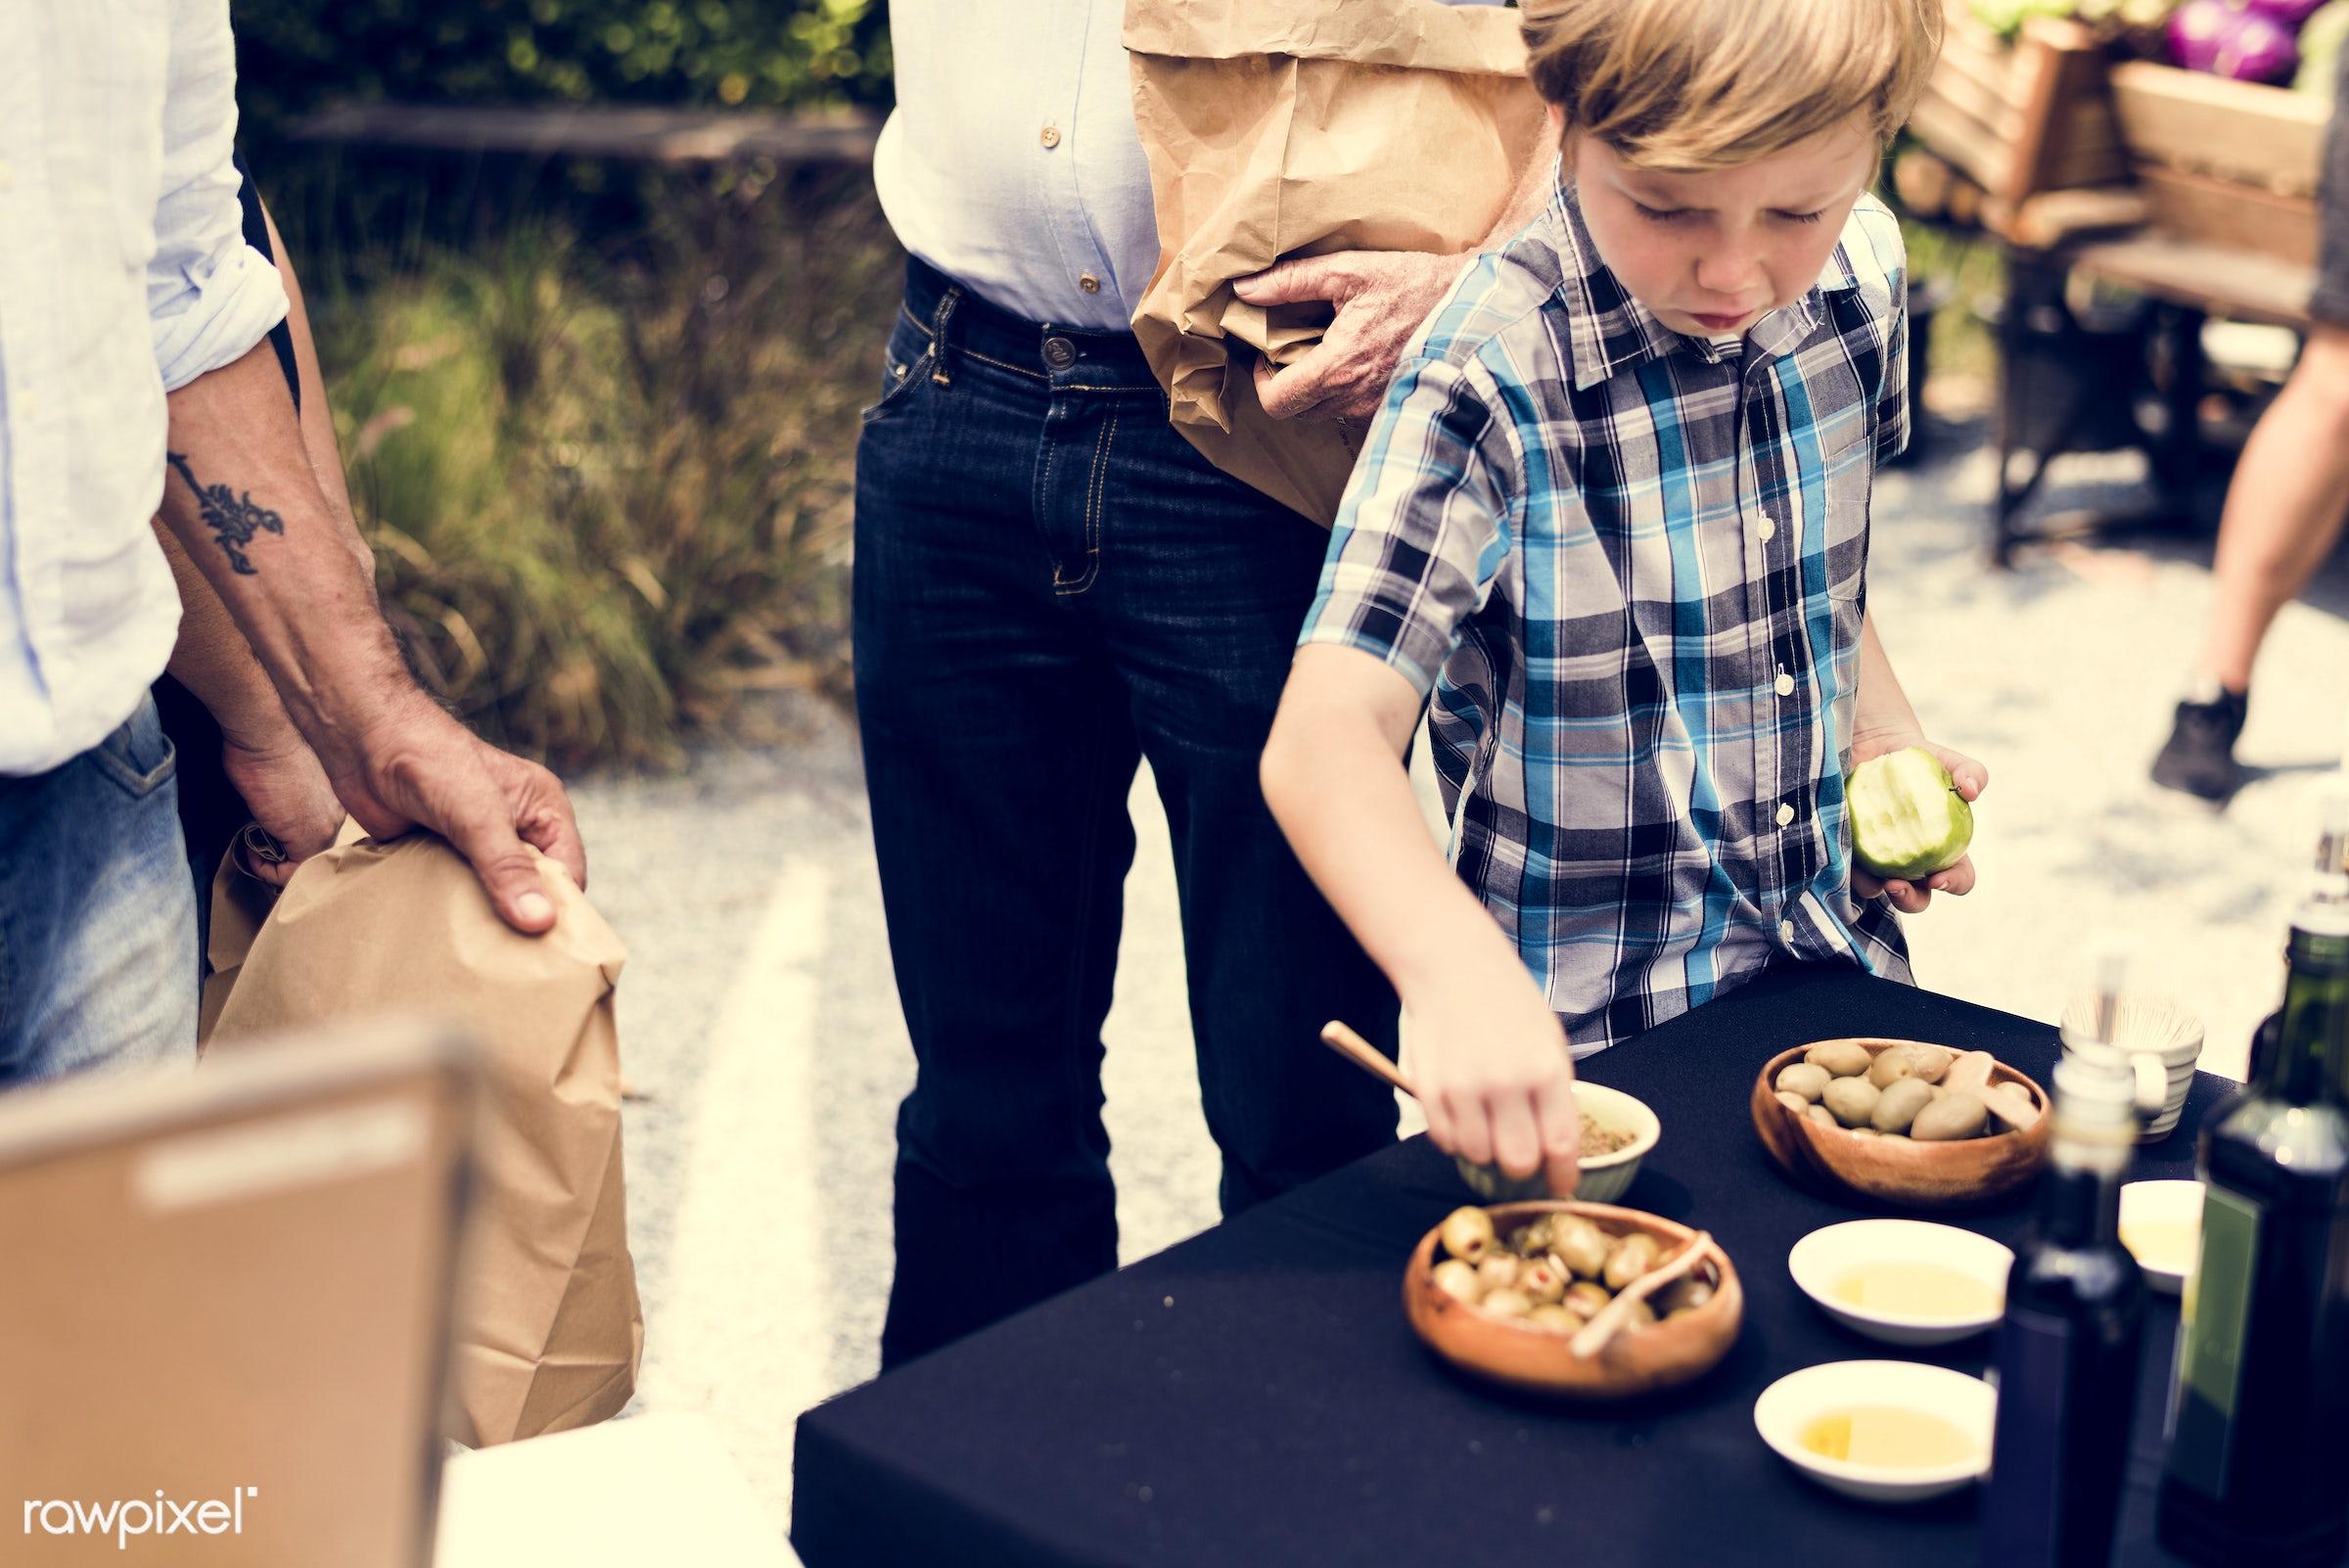 shop, person, cuisine, stall, goods, children, little, show, homemade, people, taste, toothpick, olive, preserve, oil, kid,...